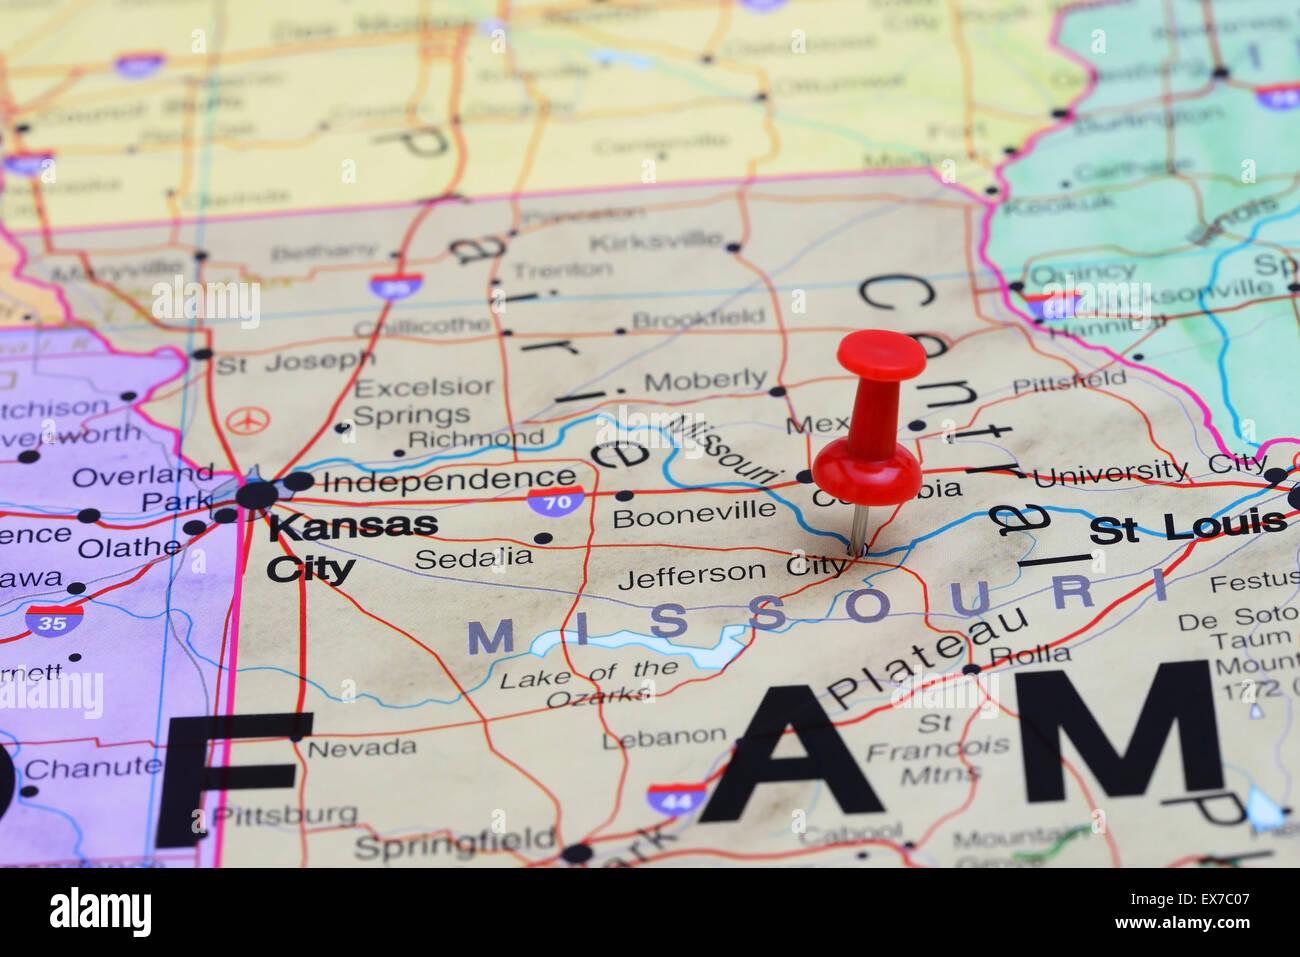 Jefferson City pinned on a map of USA Stock Photo: 84985607 - Alamy